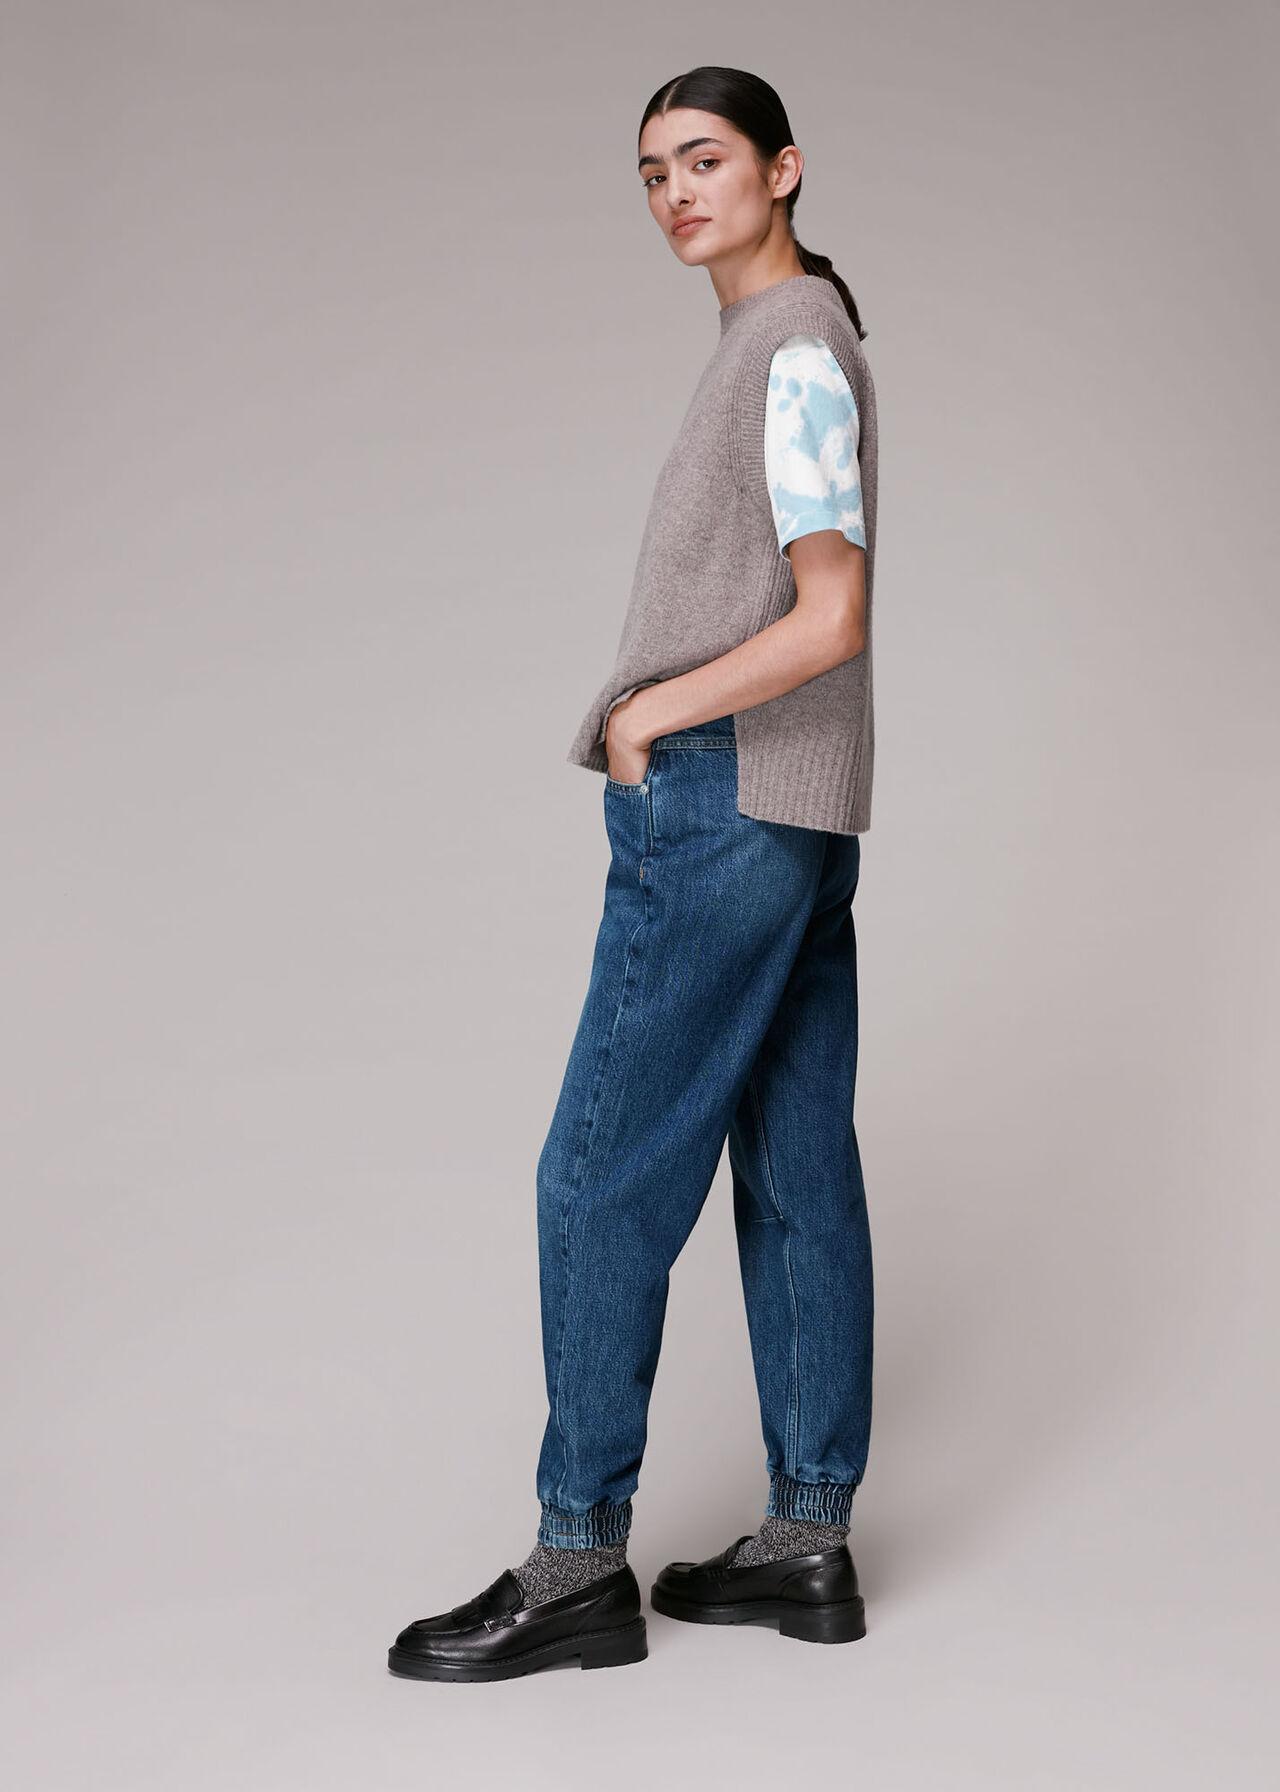 Authentic Izzey Cuffed Jean